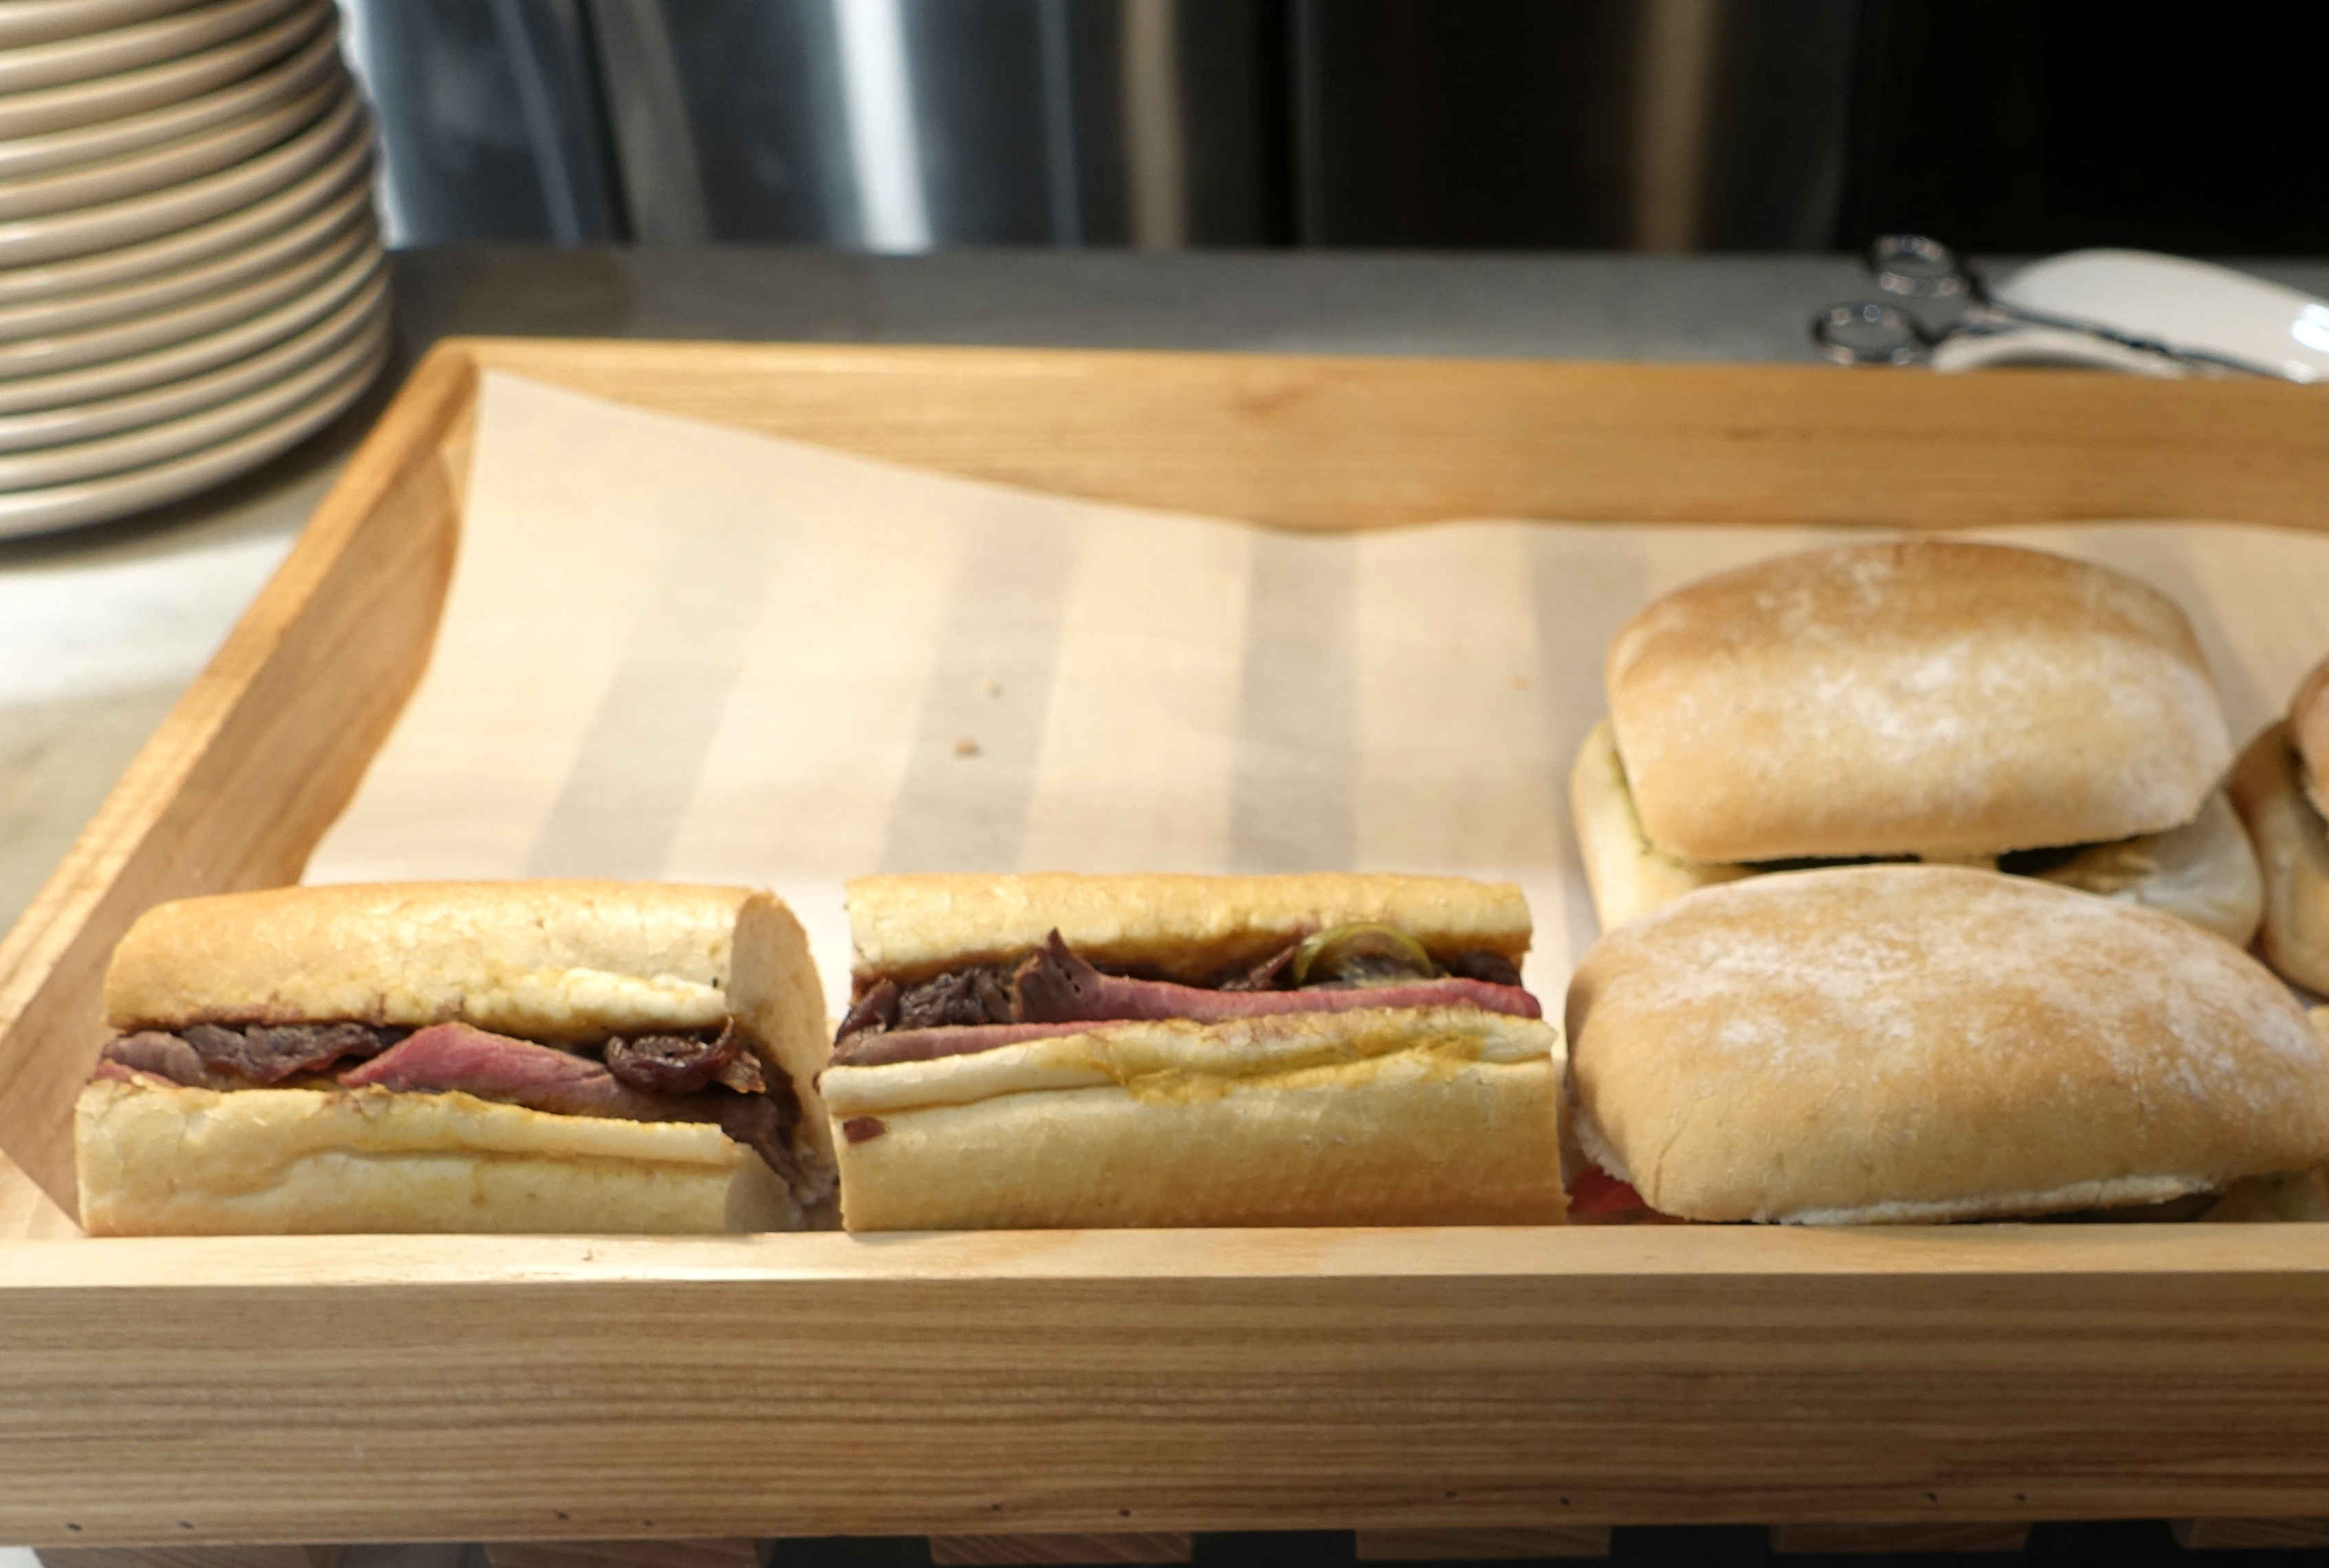 Pork and Onion Confit Sandwiches, The Pier Business Class Lounge Review, HKG